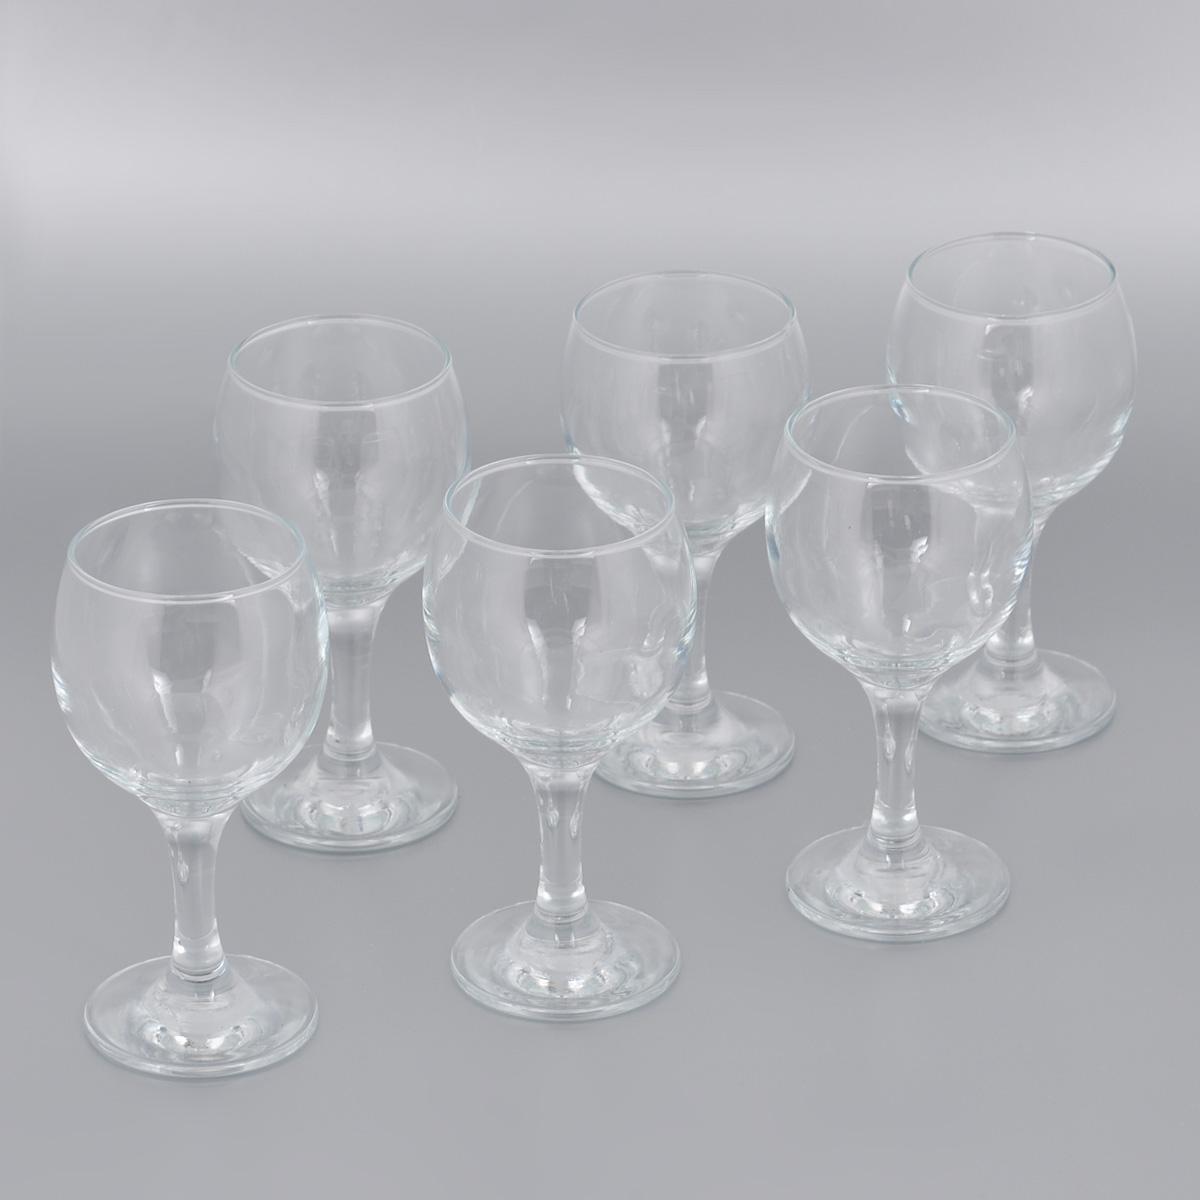 Фото - Набор бокалов для красного вина Pasabahce Bistro, 225 мл, 6 шт набор бокалов для мартини pasabahce bistro 170 мл